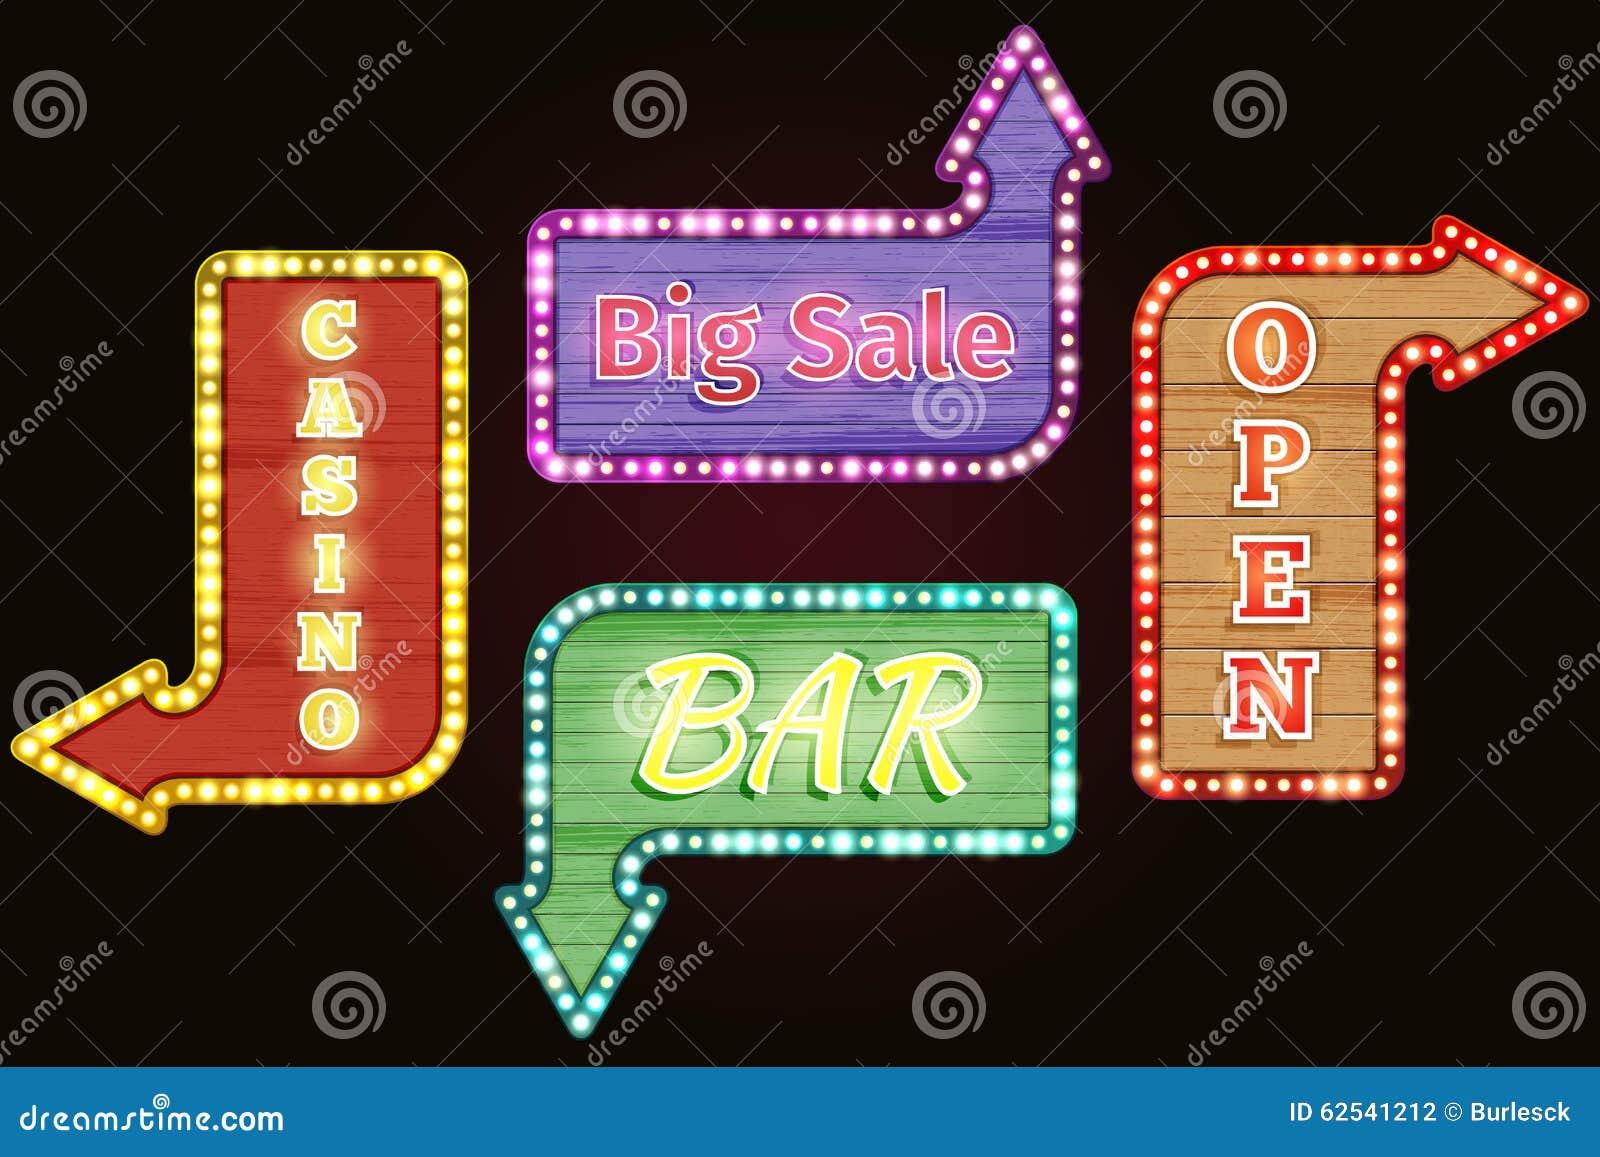 Open, Big Sale, Casino, Bar Retro Neon Signs Stock Vector